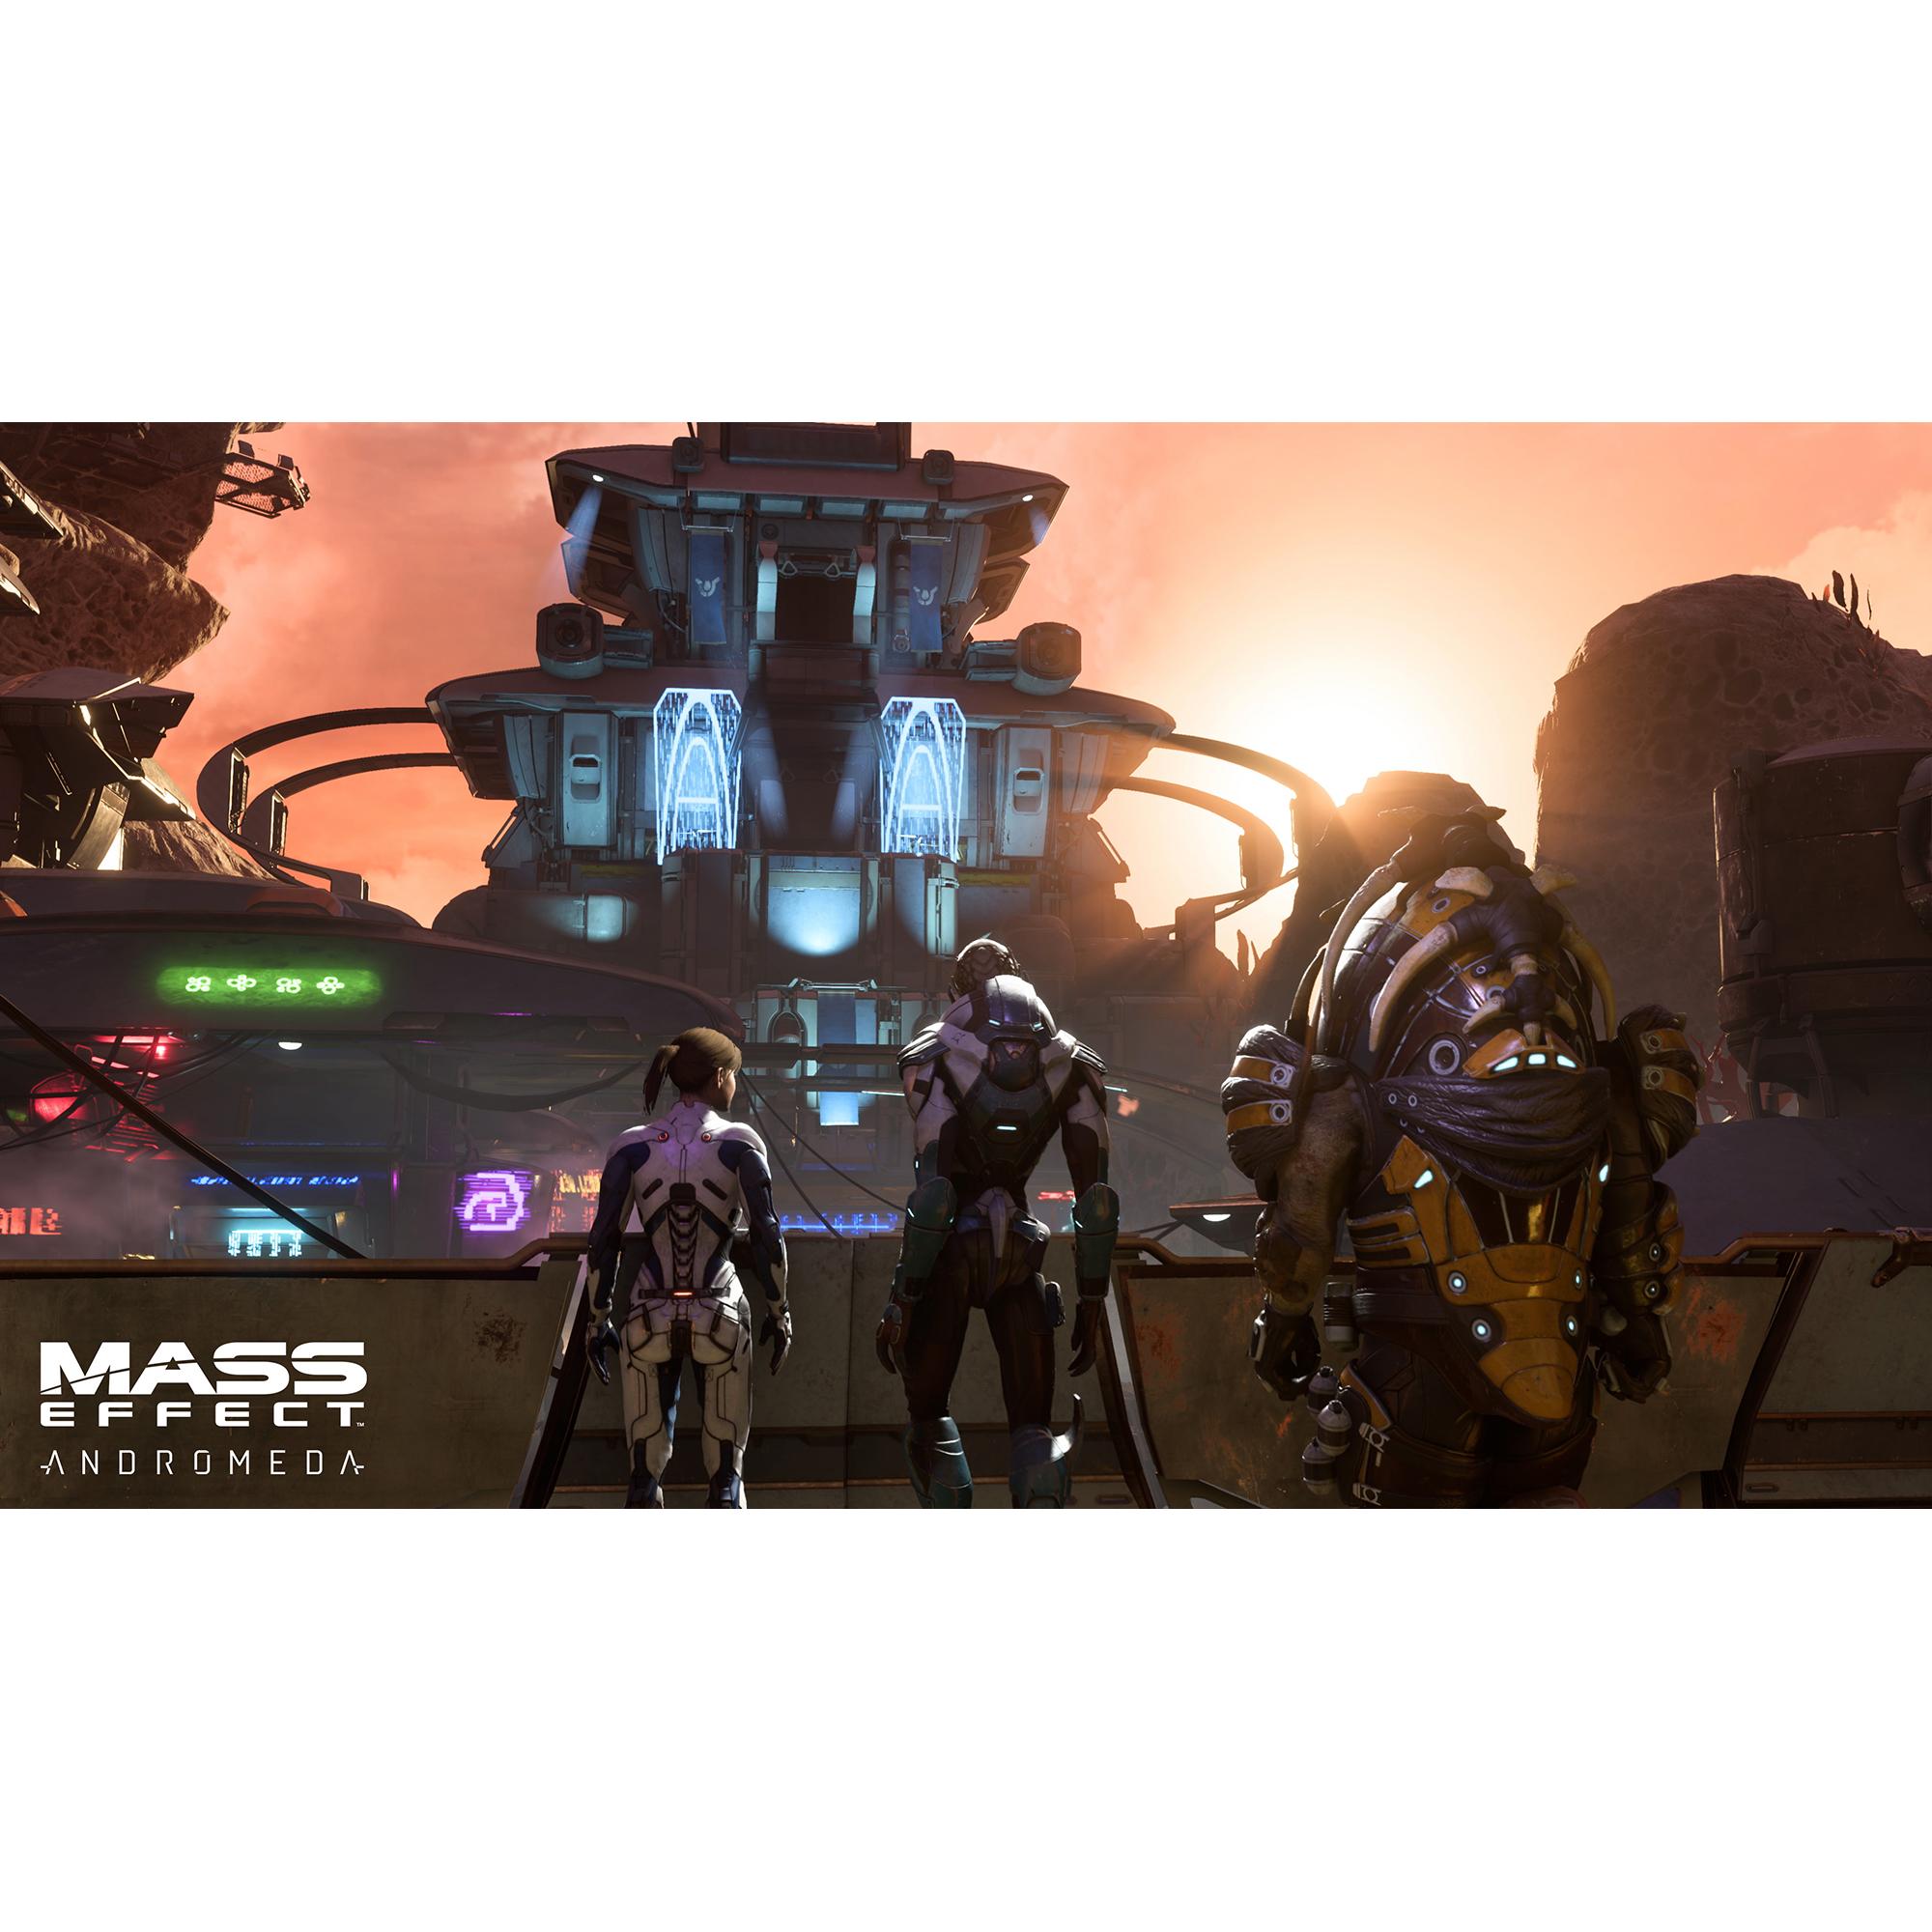 Joc Mass Effect: Andromeda pentru Xbox One 5